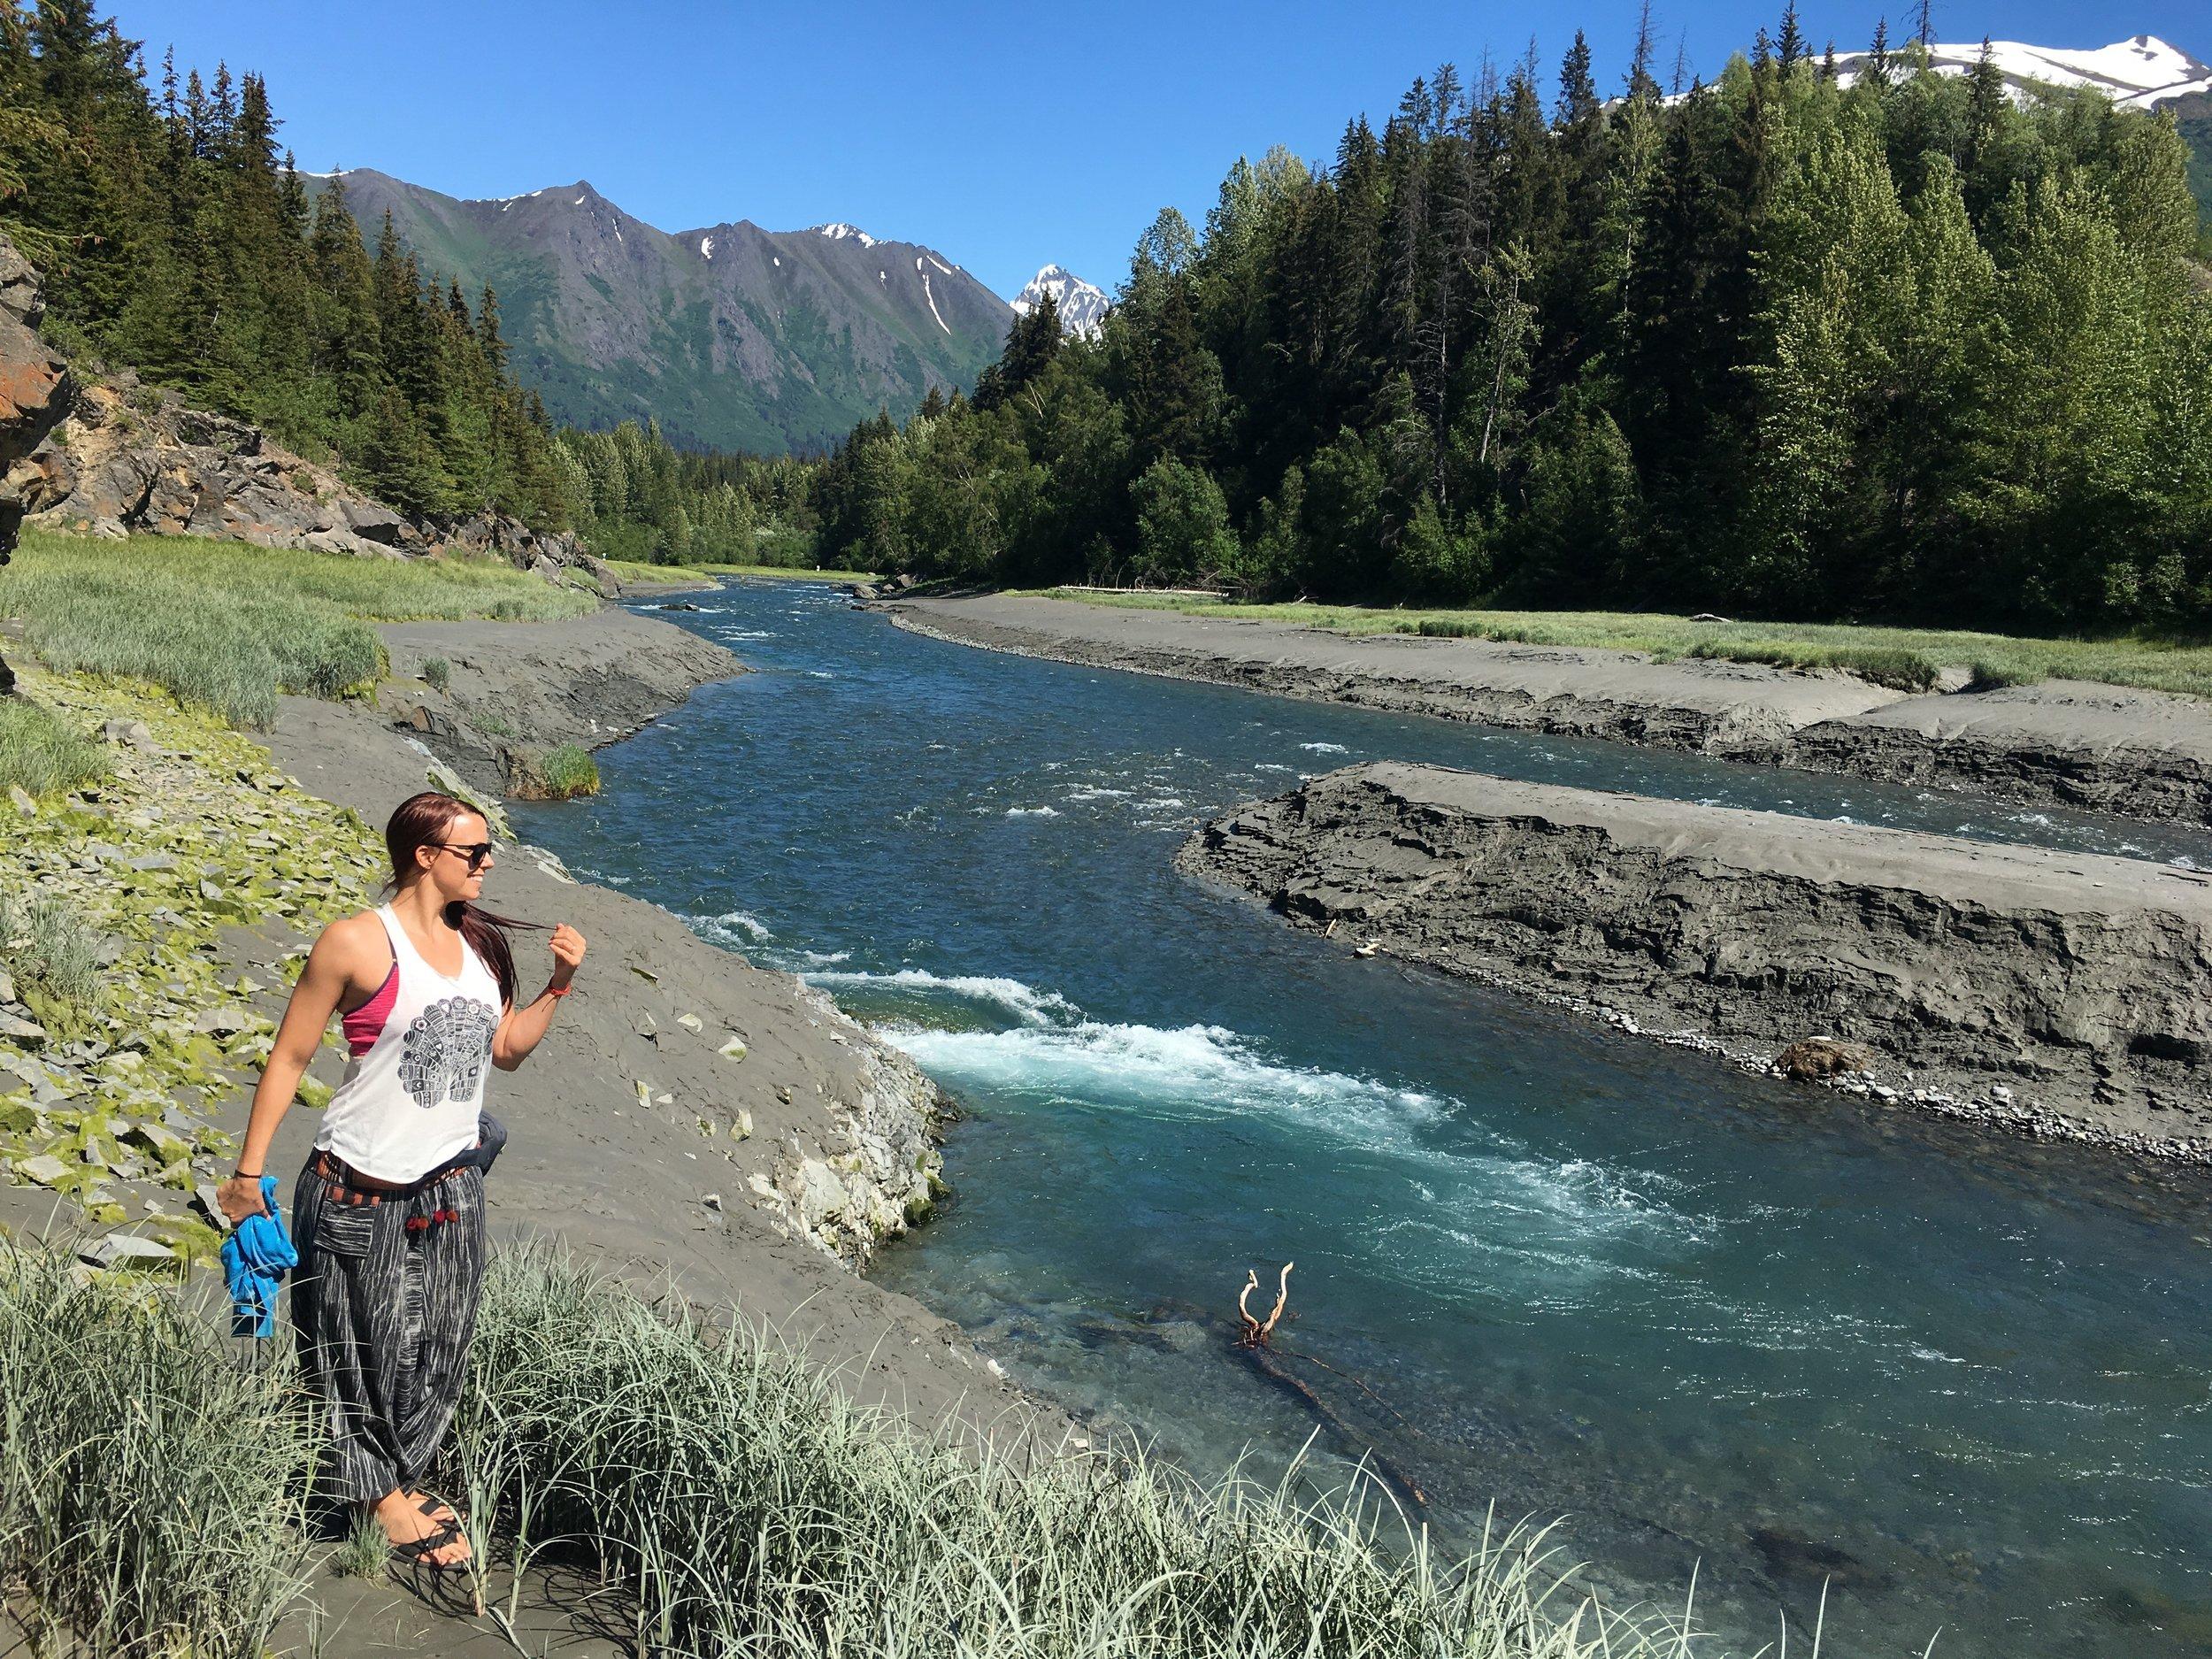 Just another beautiful Alaskan scenery.